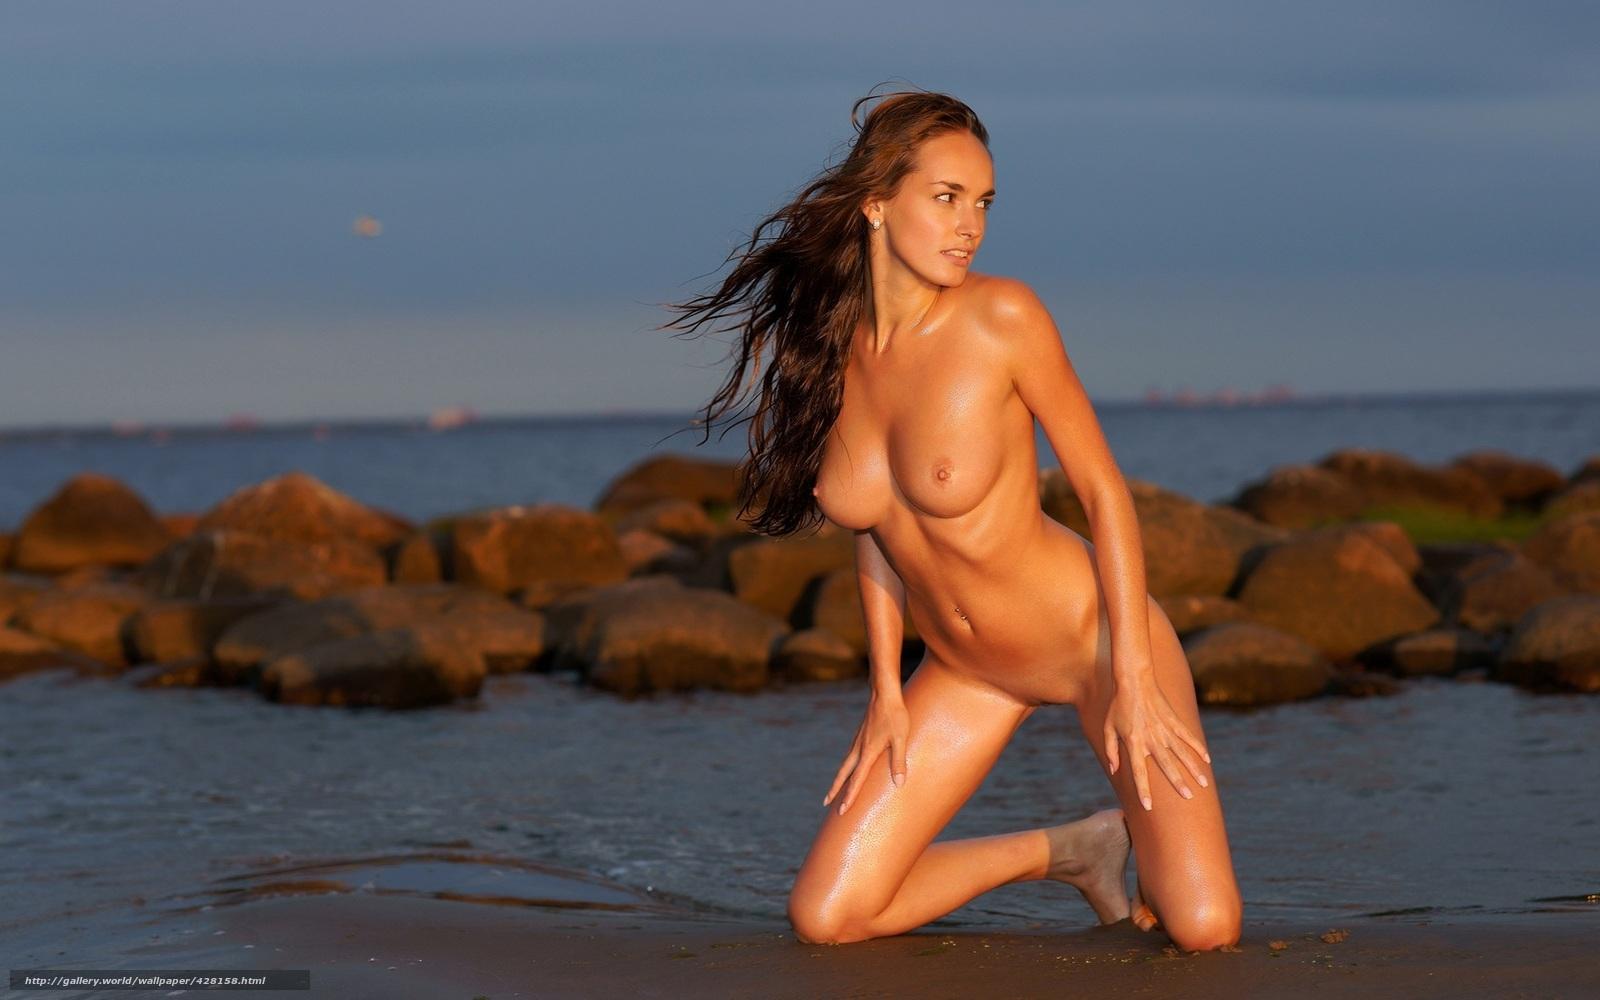 Pic sexnud pics nudes photos